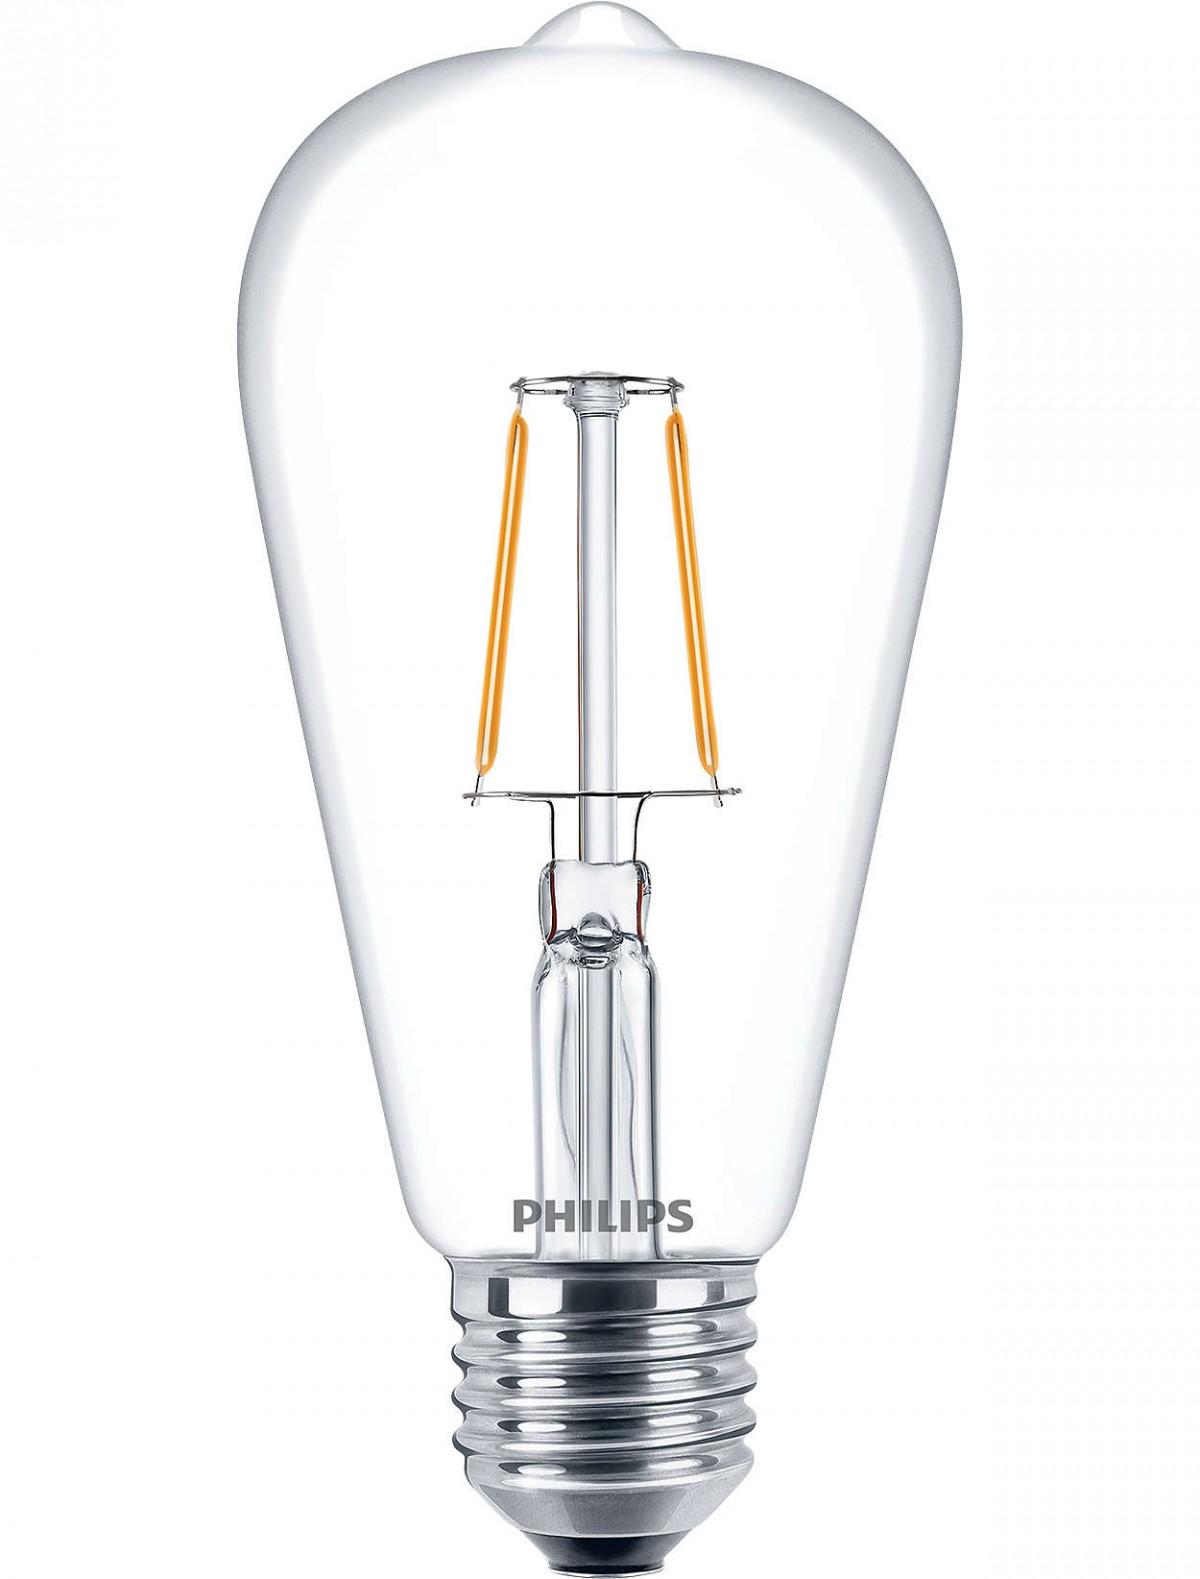 LED žárovka úsporná Philips 2,3W -> ekvivalent 25W E27 - Classic LEDbulb ND 2.3-25W E27 827 ST64 CL